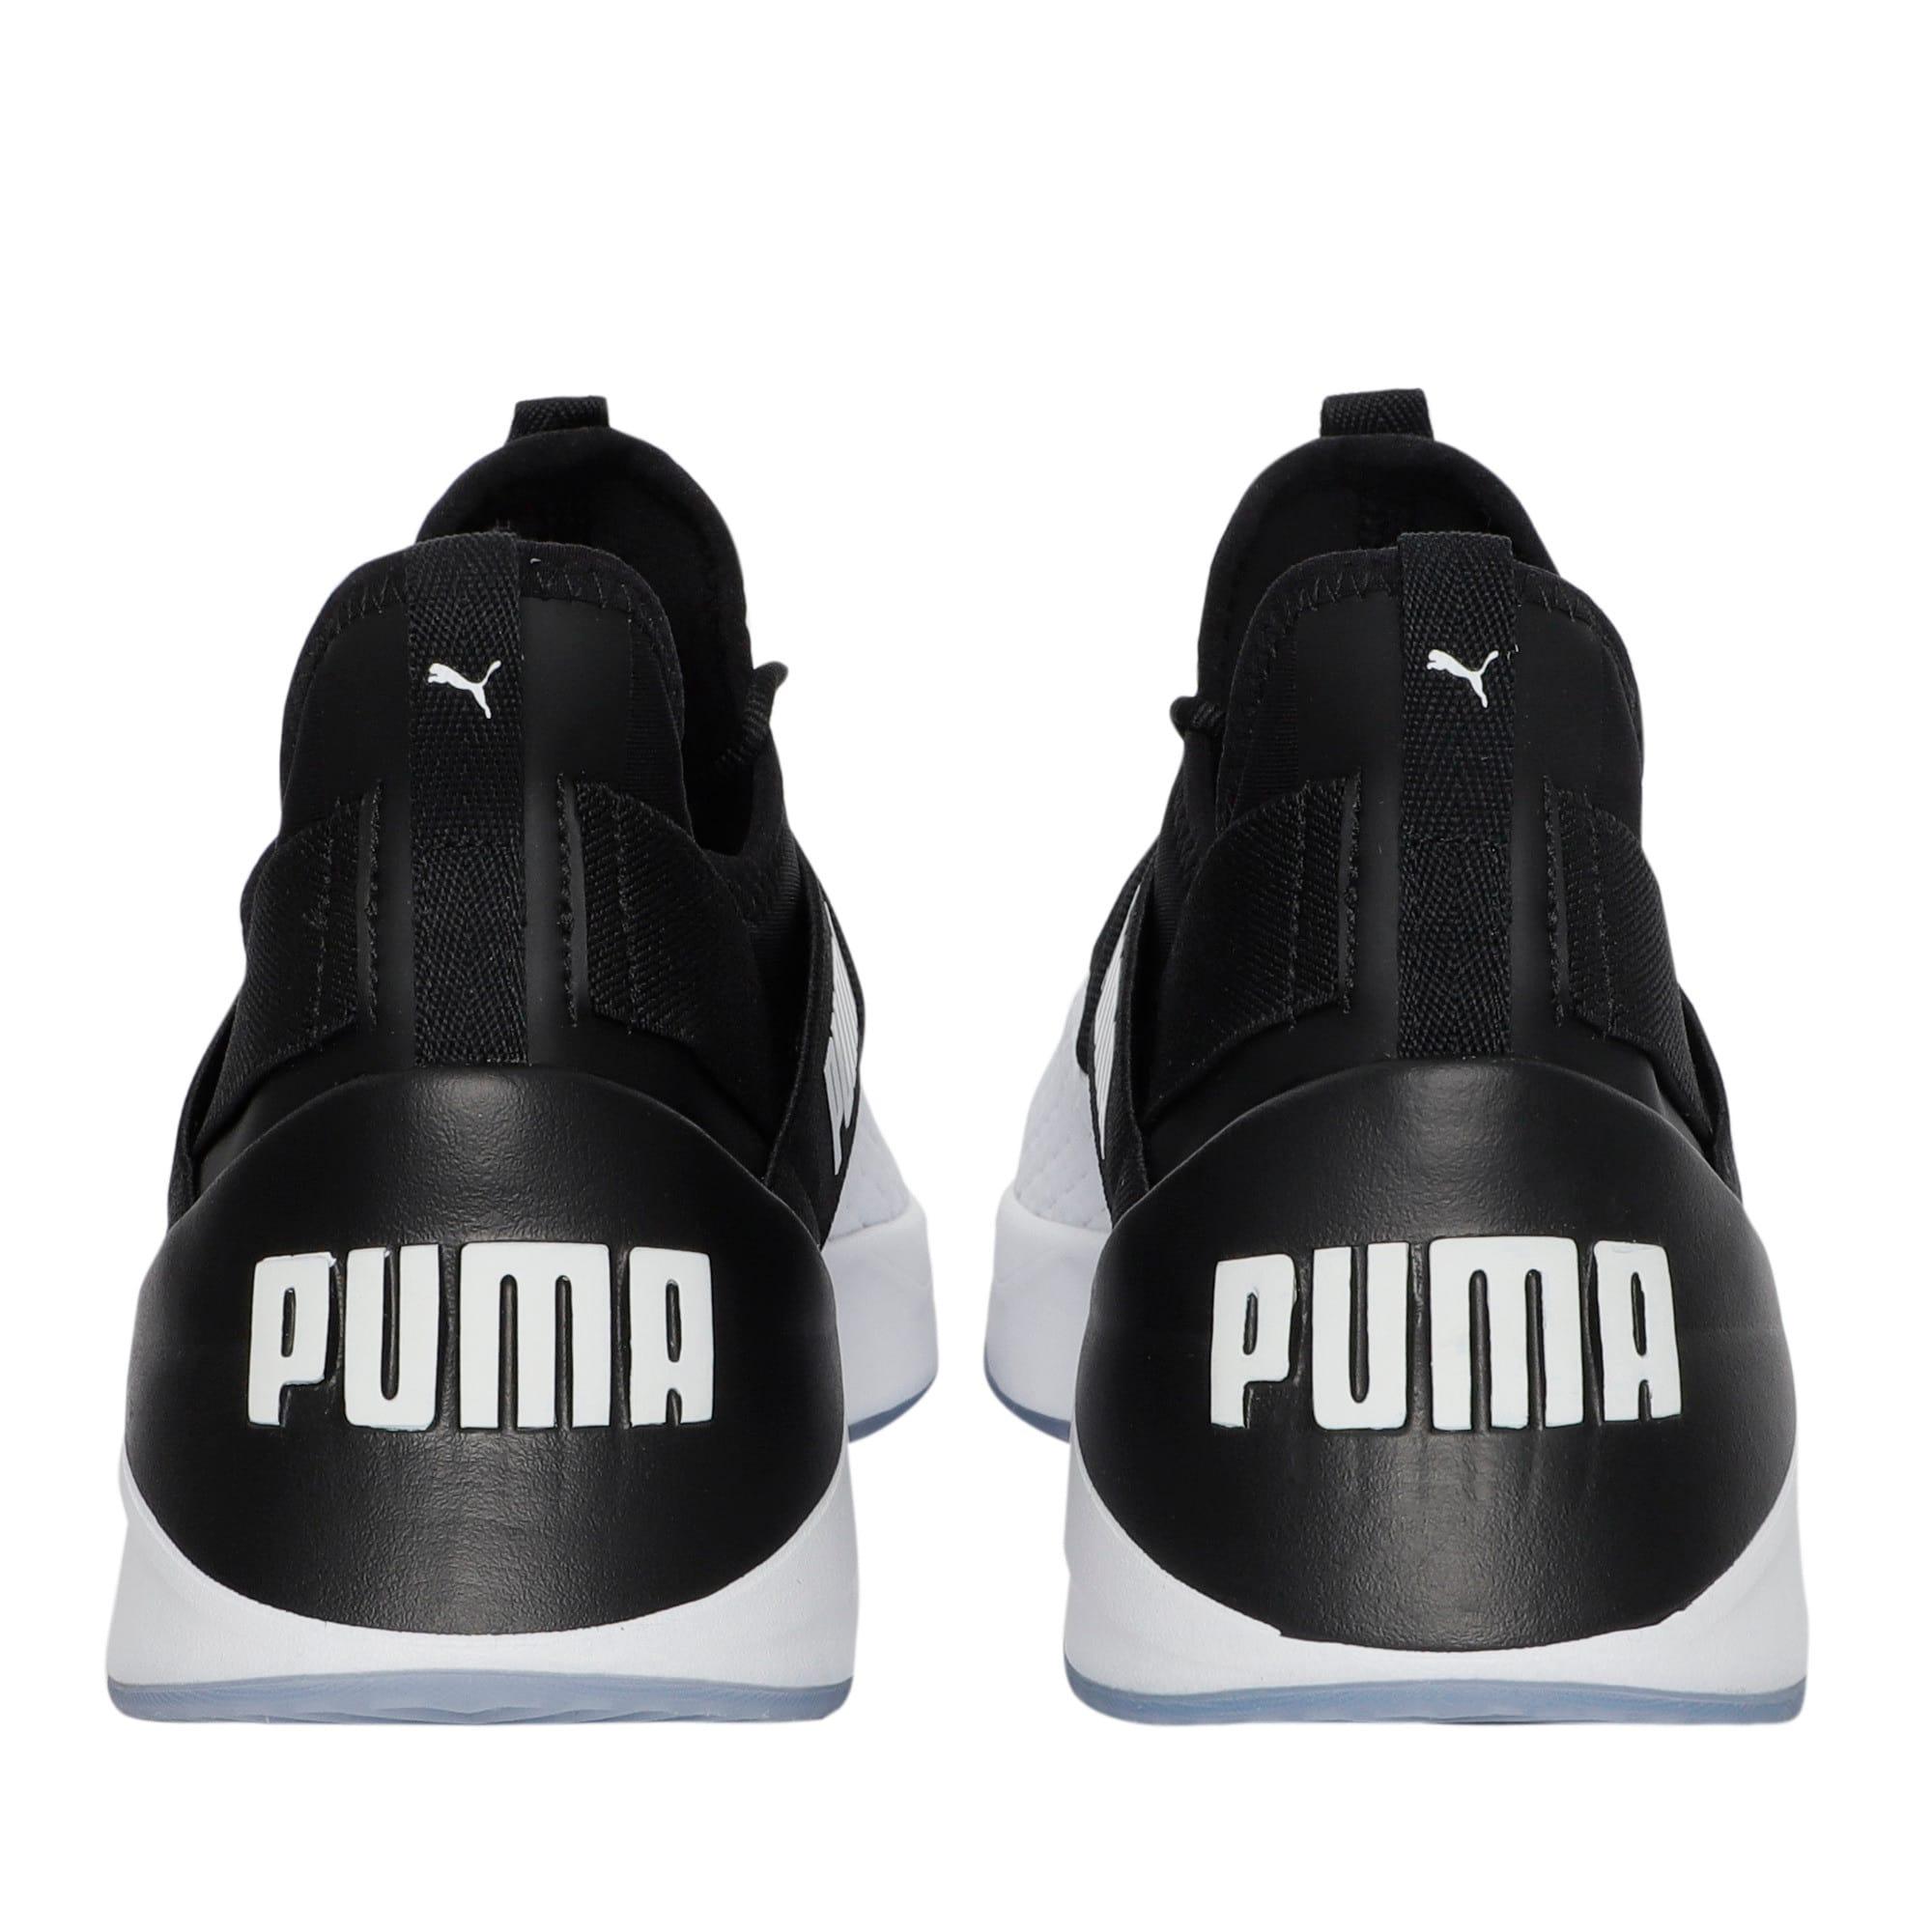 Thumbnail 6 of Jaab XT one8 Men's Training Shoes, Puma White-Puma Black, medium-IND